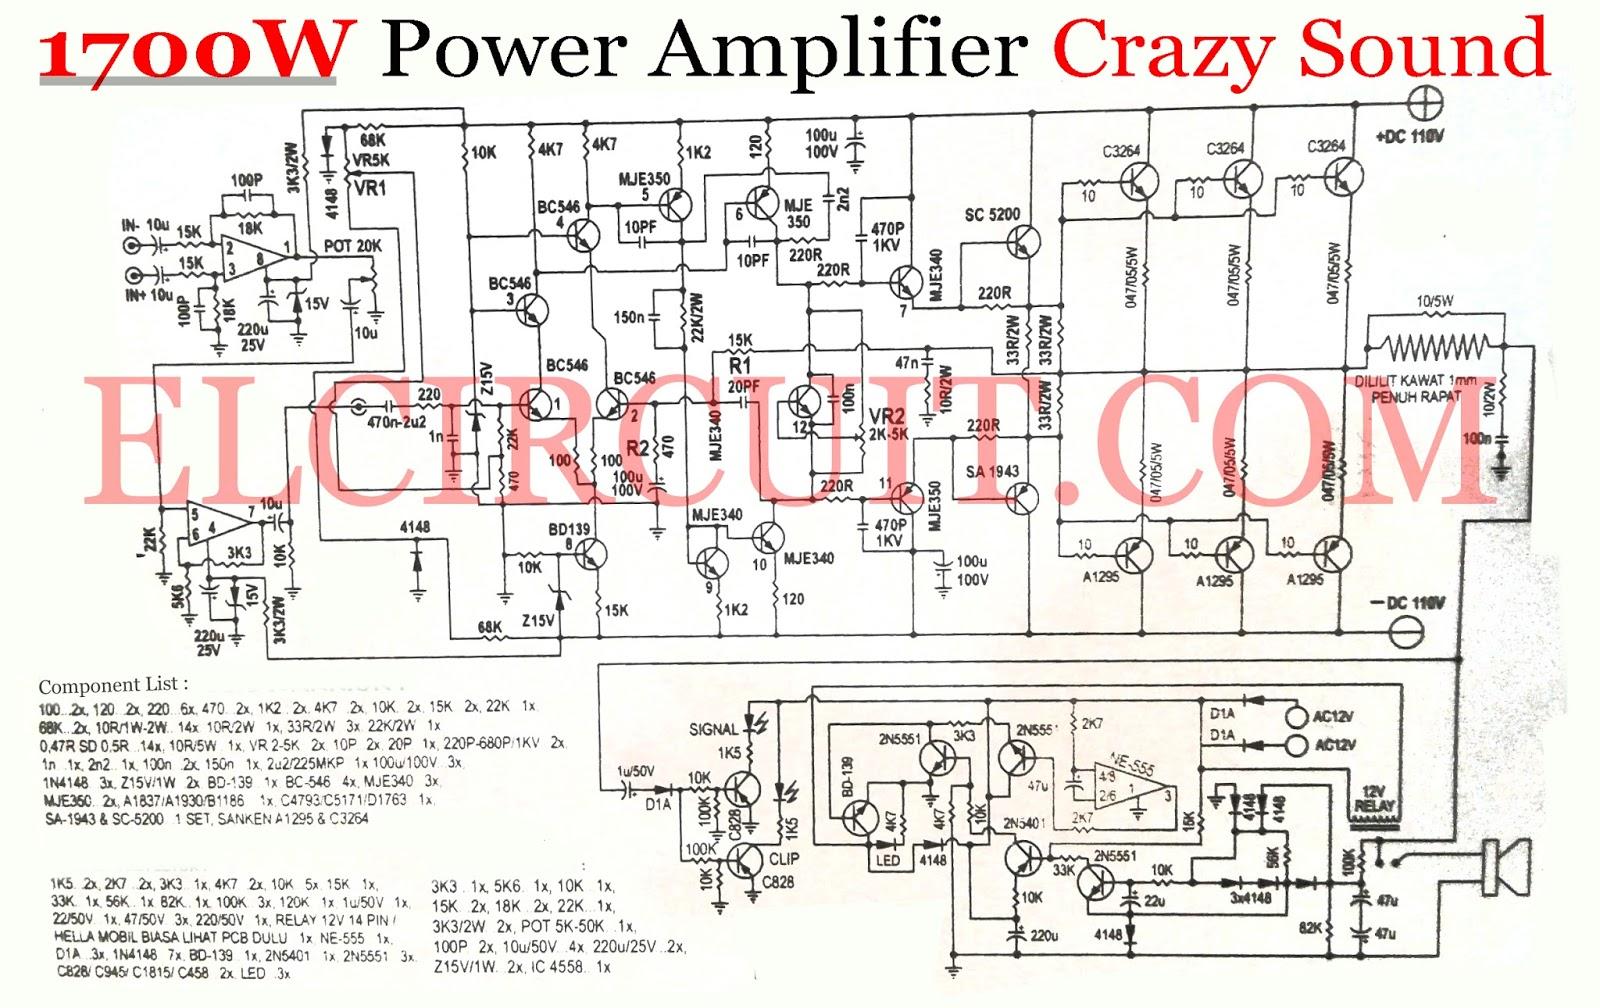 2000w audio amplifier circuit diagram wiring diagram sort 2000w audio amplifier circuit diagrams [ 1600 x 1008 Pixel ]